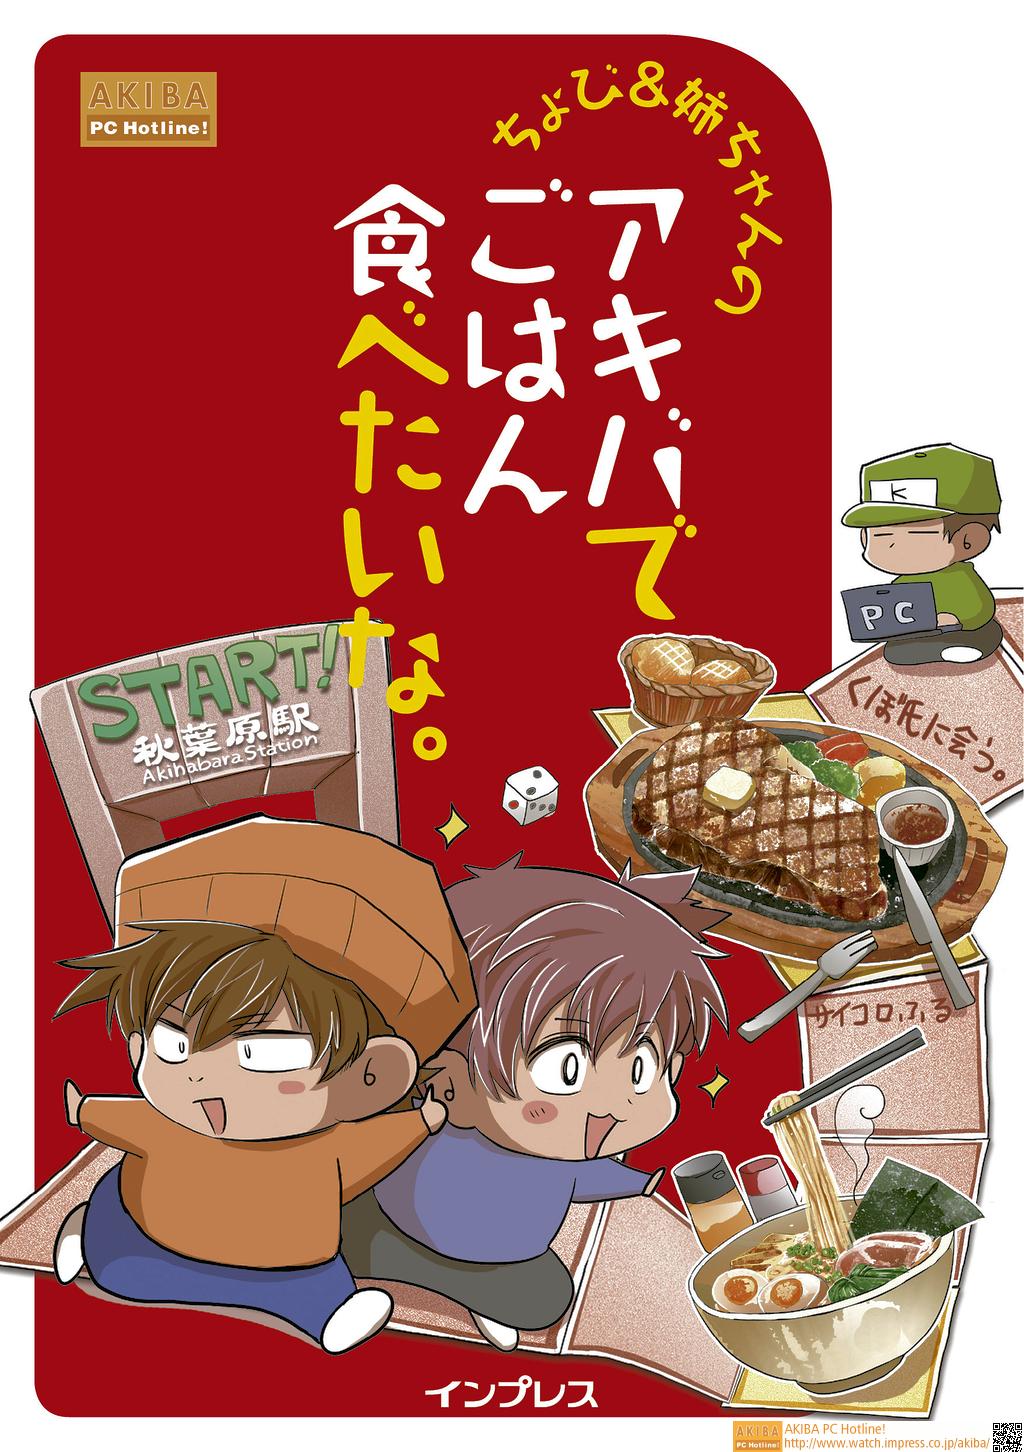 "<a class="""" href=""http://www.amazon.co.jp/exec/obidos/ASIN/4844337254/impresswatch-14-22/ref=nosim"">ちょび&amp;姉ちゃんの『アキバでごはん食べたいな。』</a>"